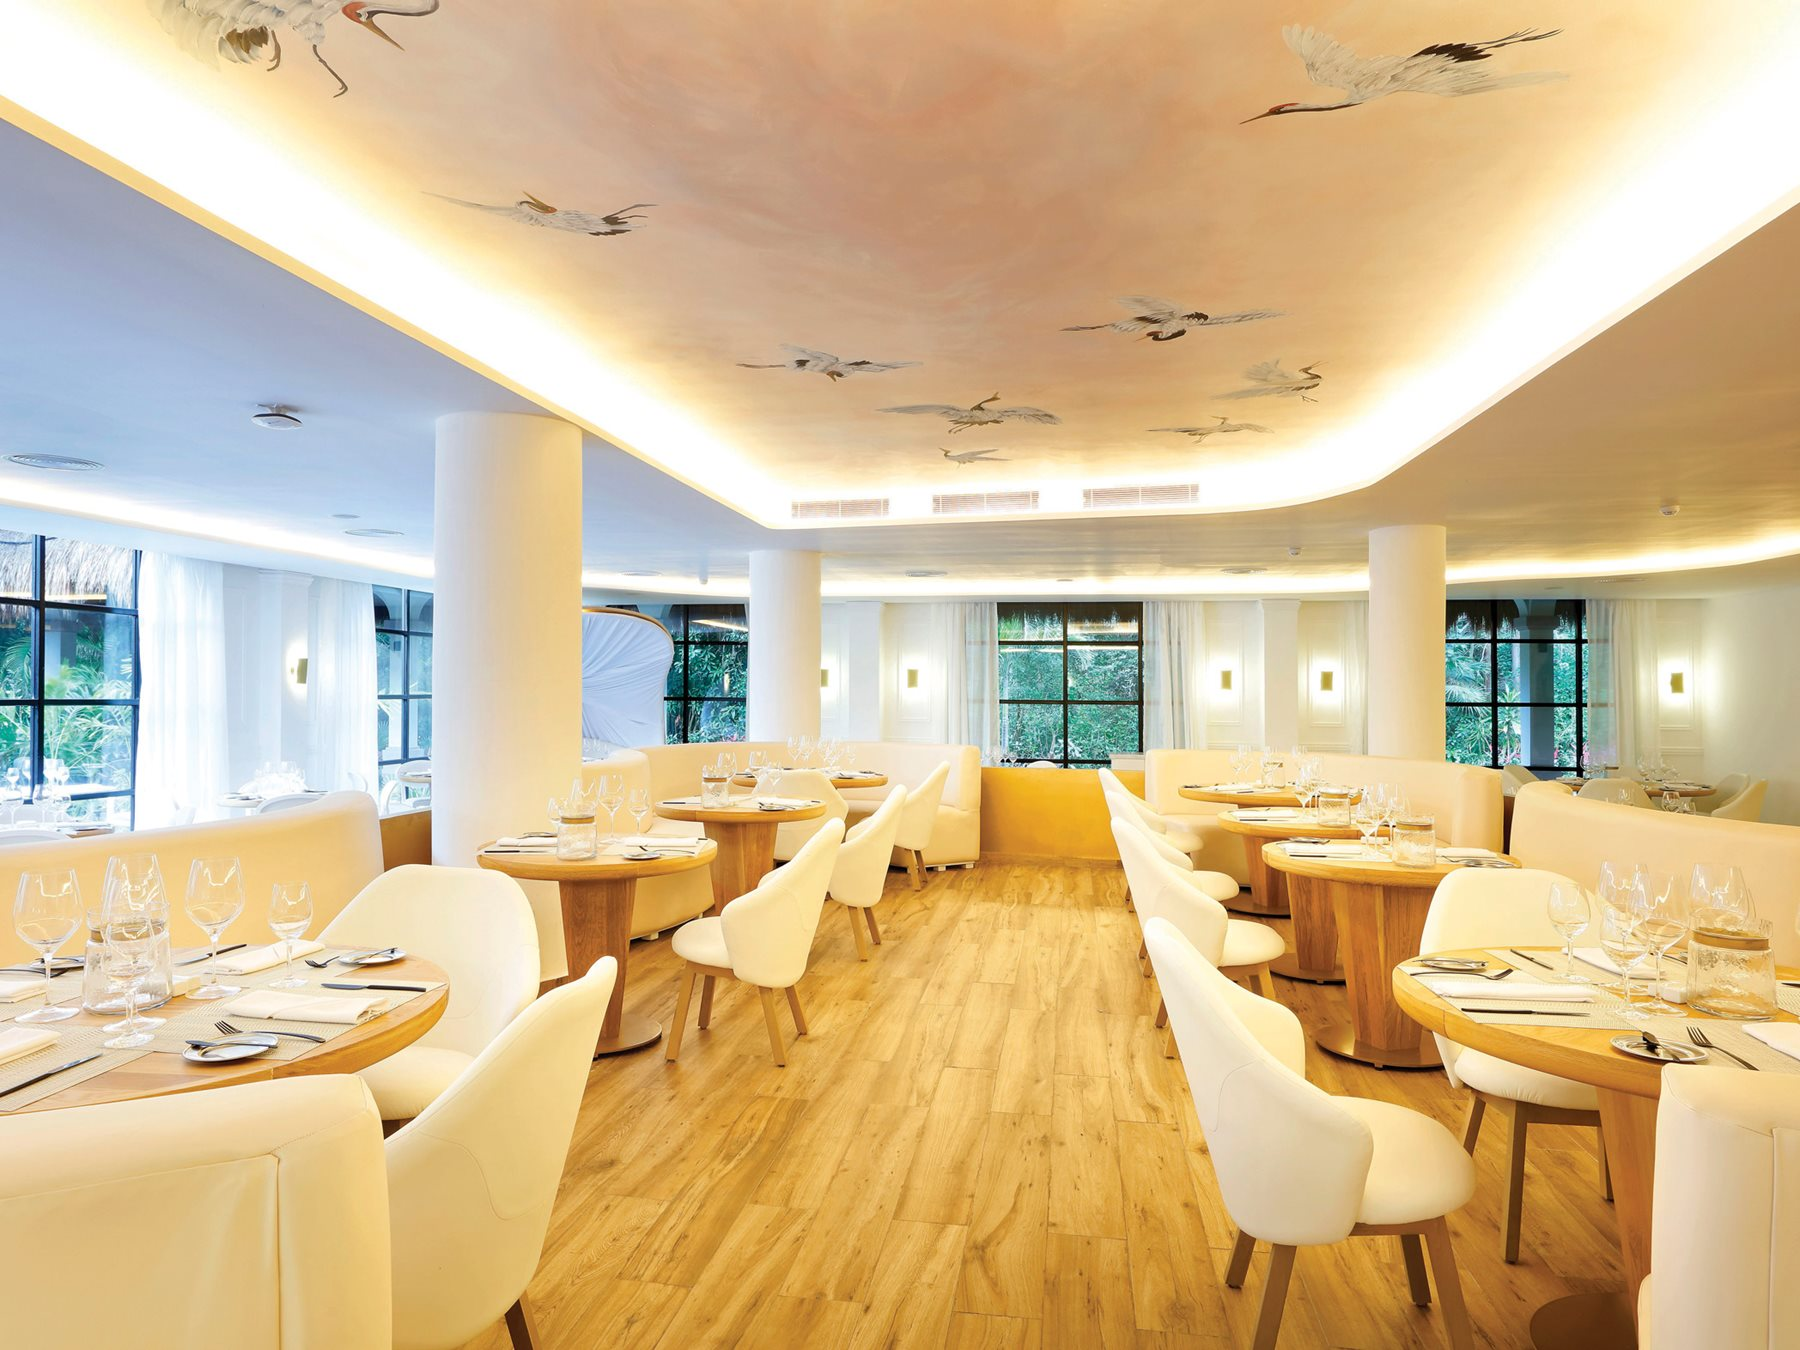 RIV-The-Royal-Suites-Yucatan-Restaurant-French-001-Render